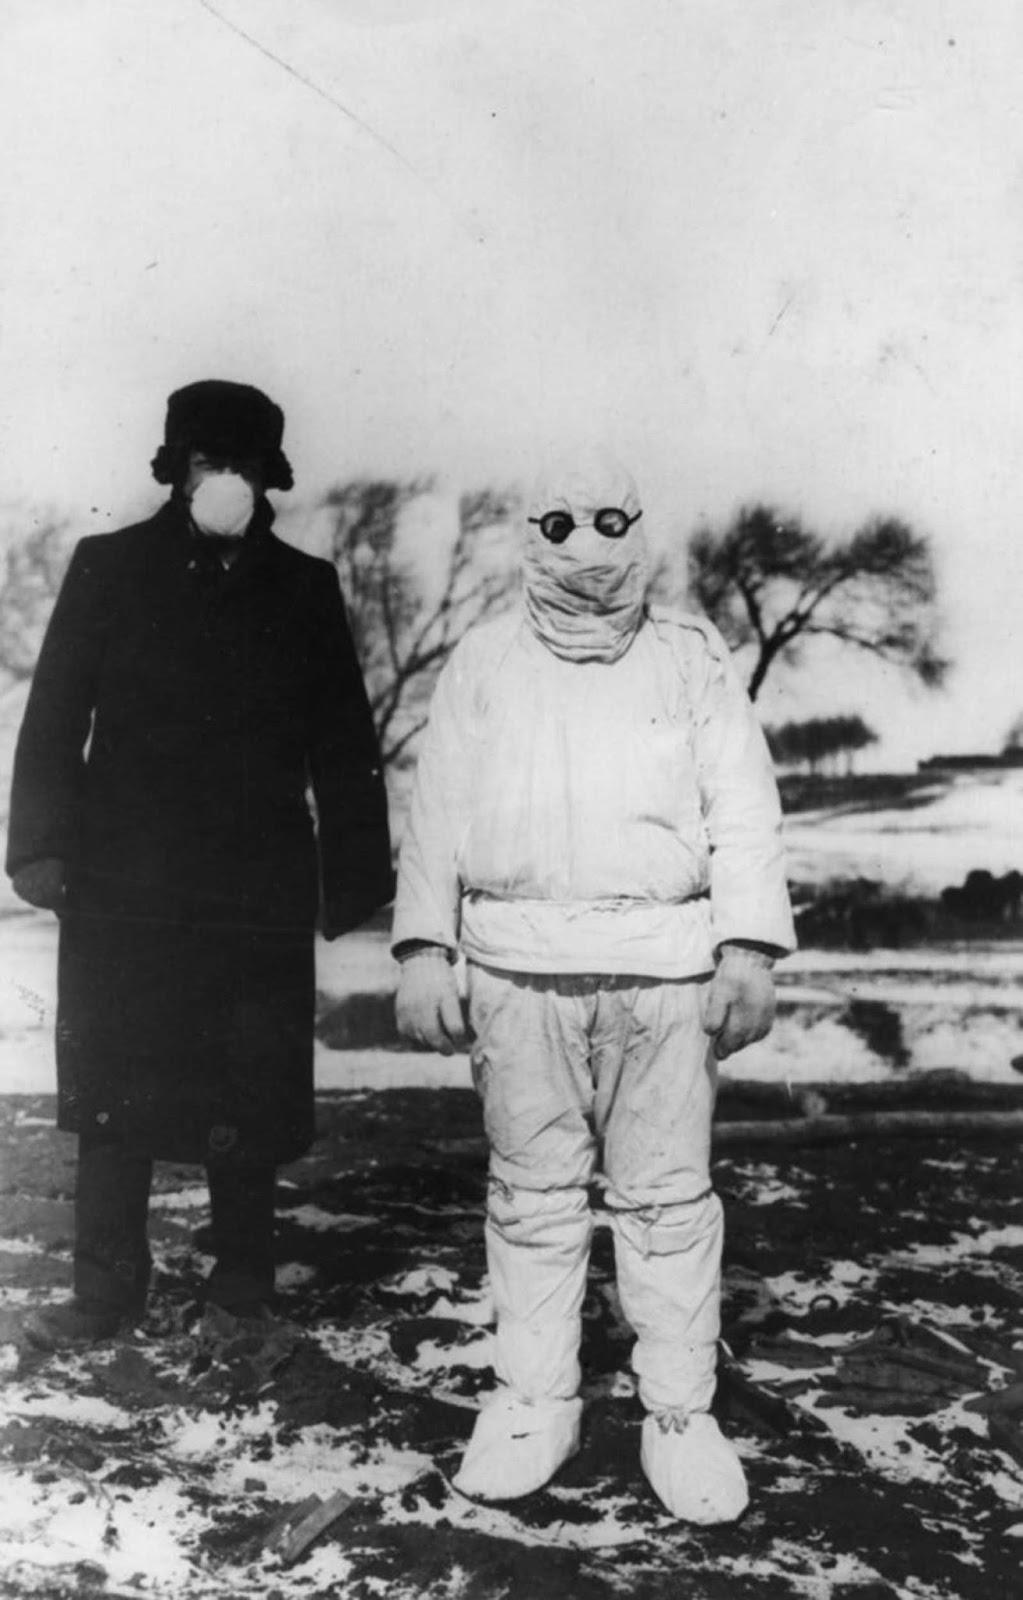 Un médico usa ropa protectora durante un brote de peste en Manchuria, alrededor de 1912.